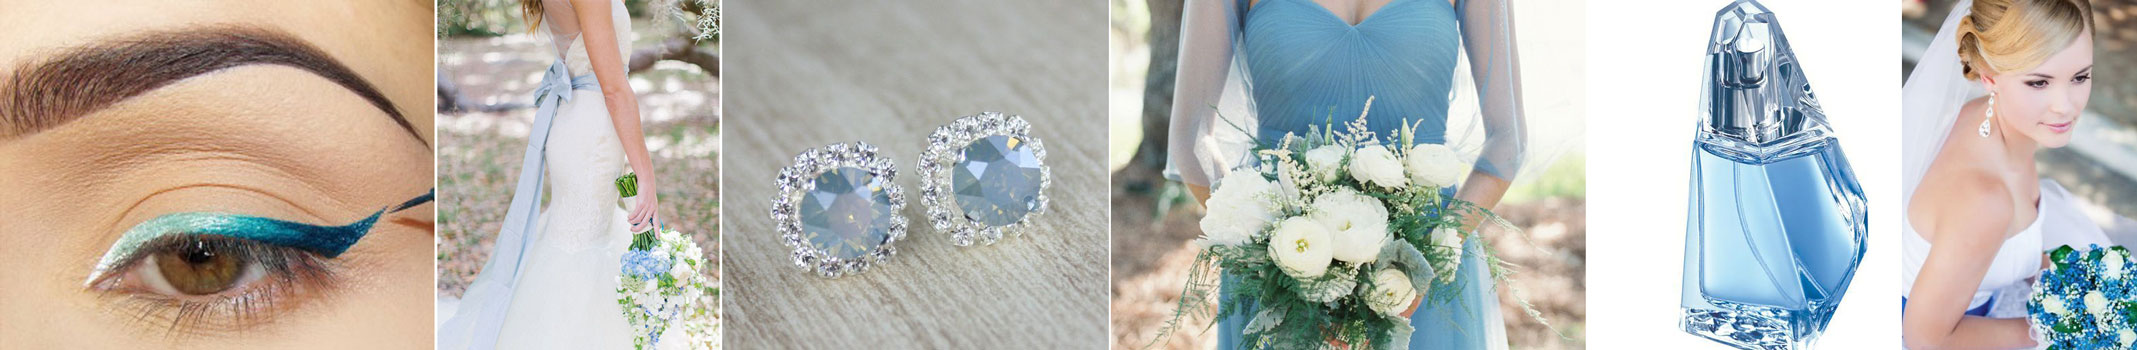 poradnik ślubny wedding planner'ki - błękitny pastelowy ślub